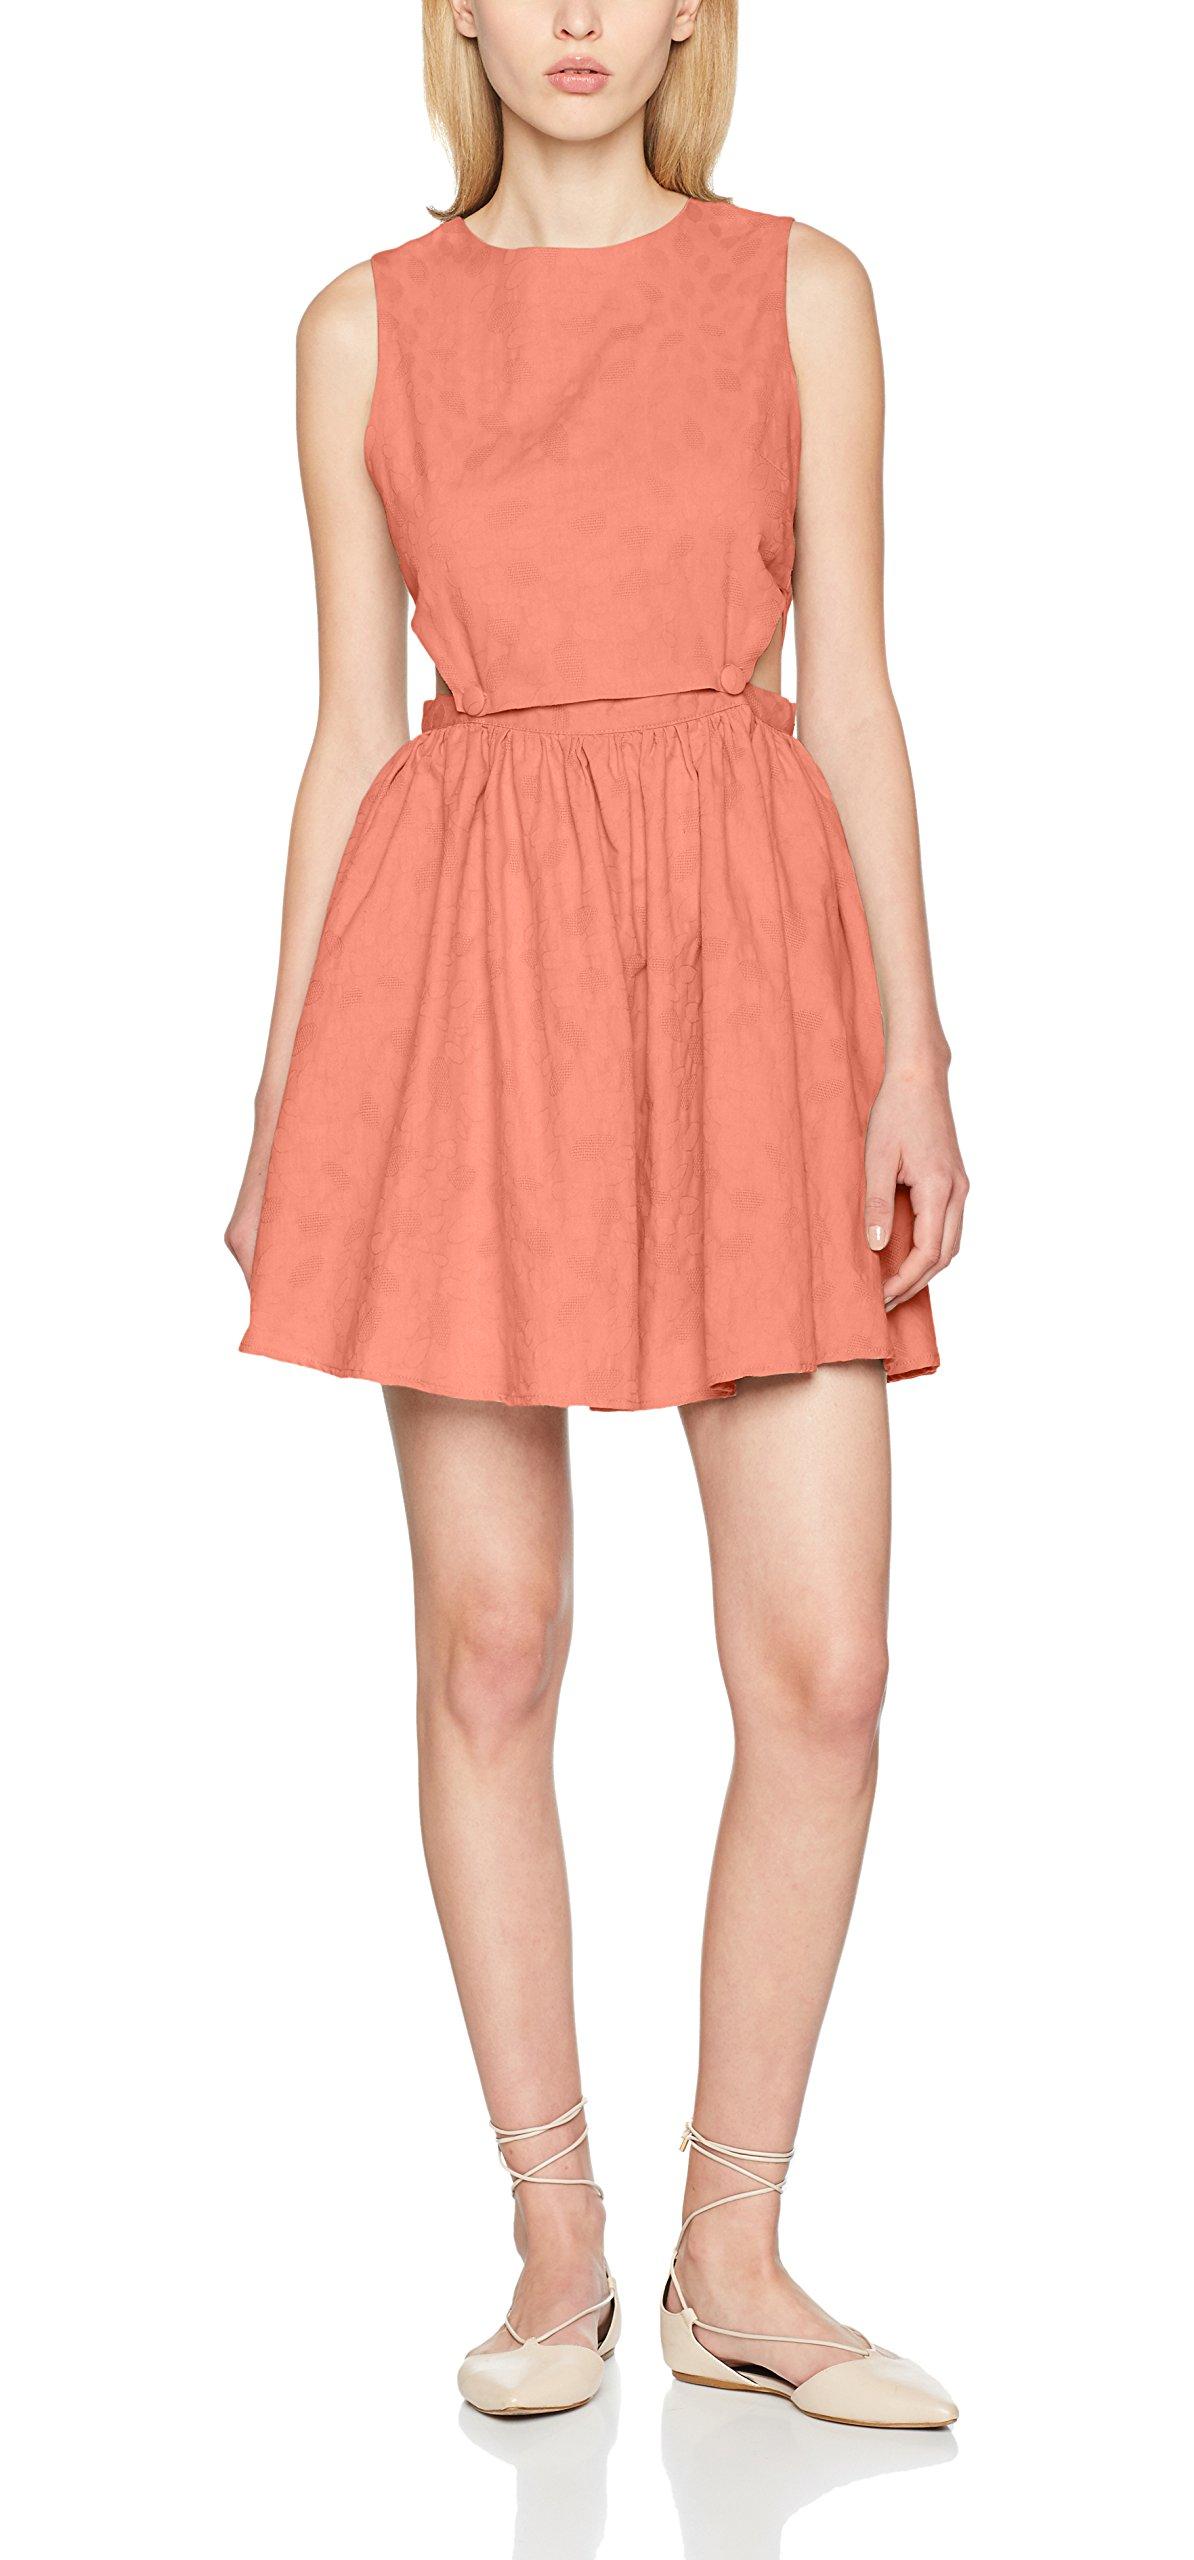 Pepaloves Zulema Orangepeach 108356Xs Femme Dress Robe nm80Nw